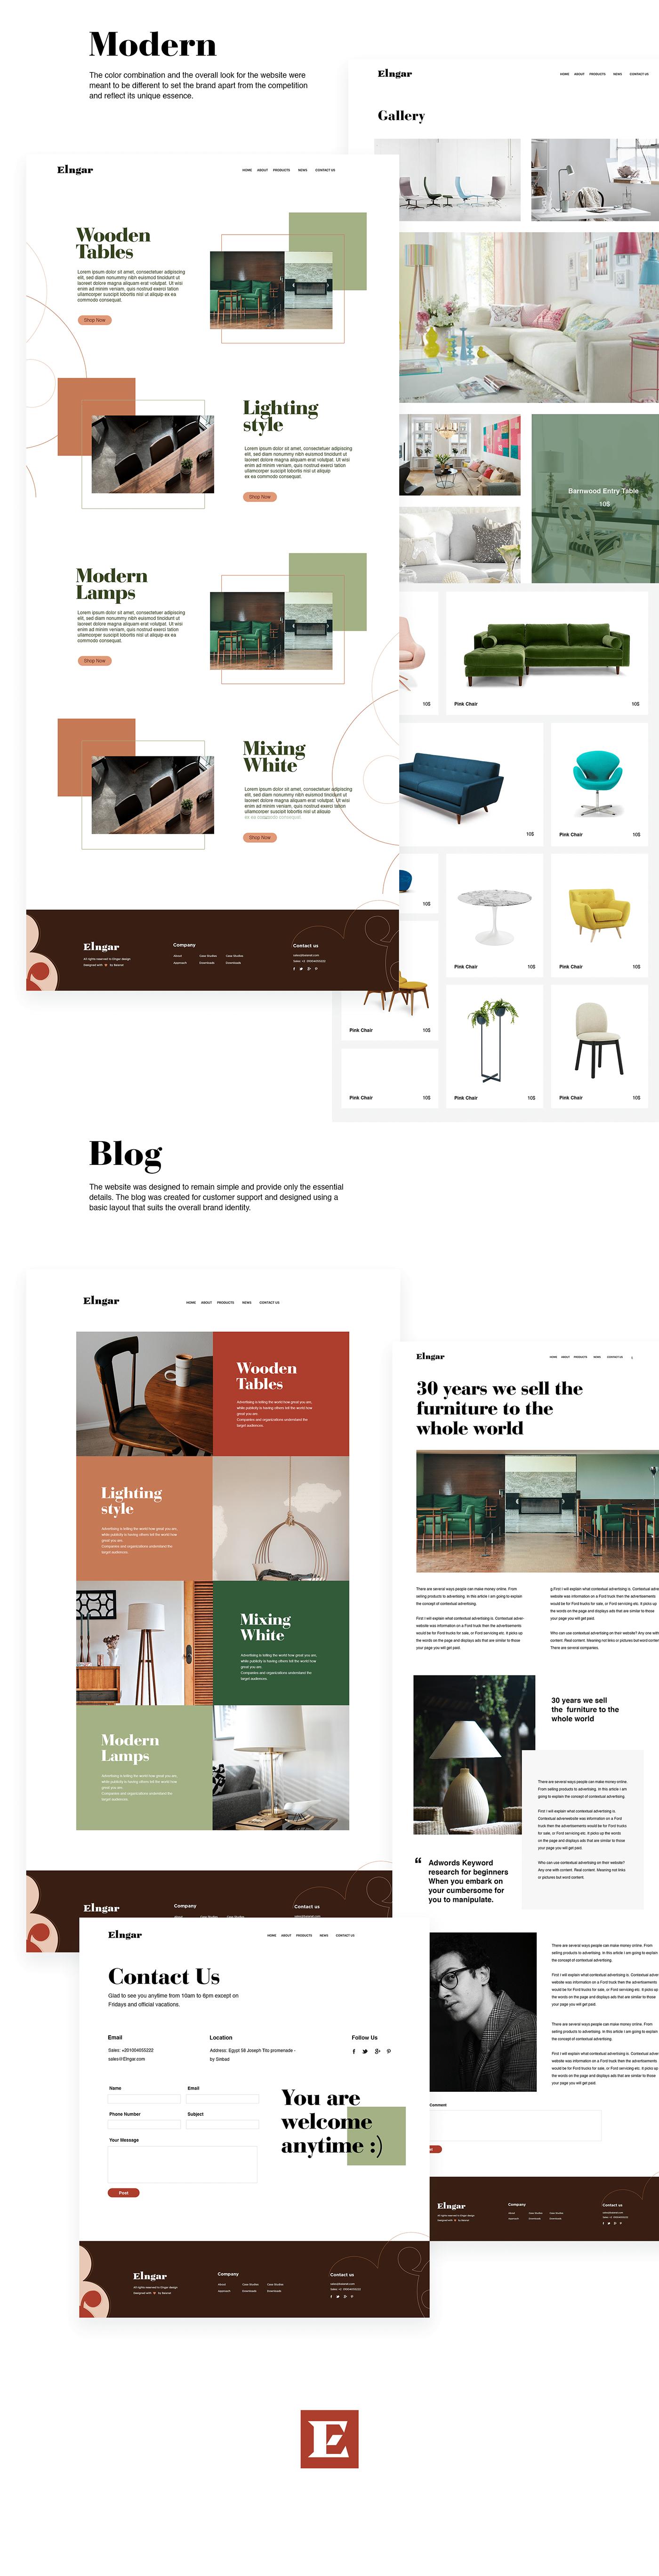 Elngar Brand Identity And Website Design On Behance Website Design Design Ultra Modern Homes